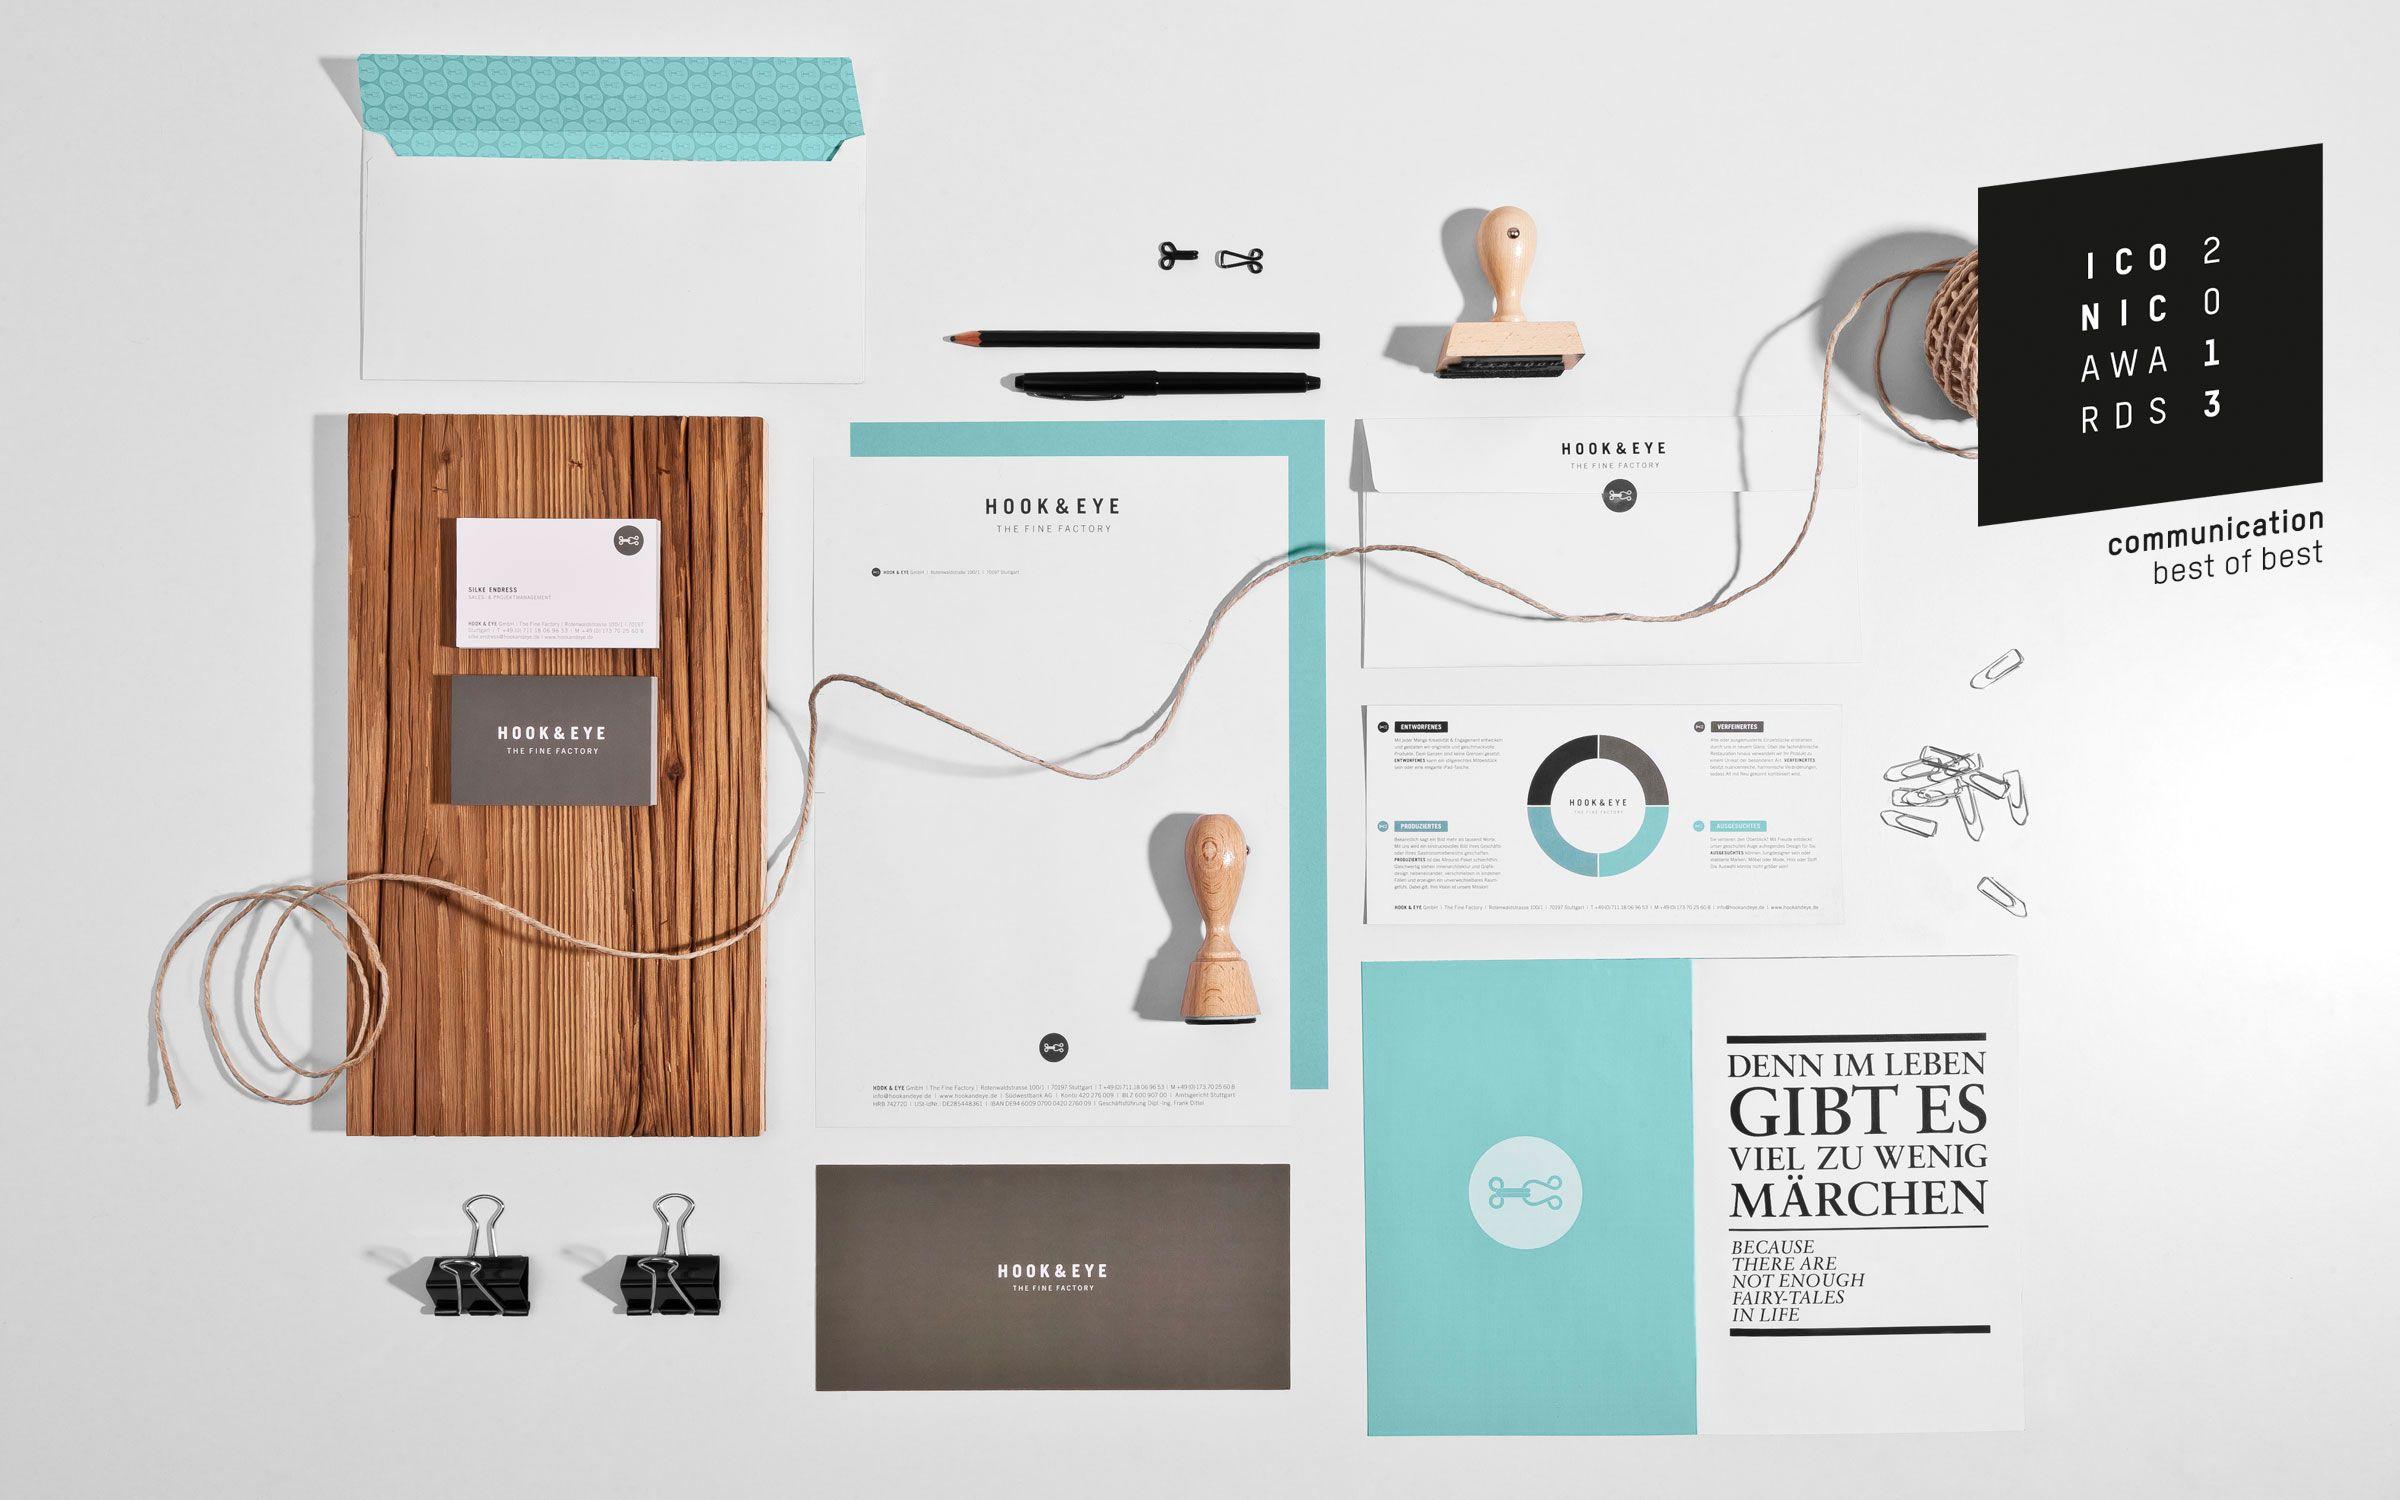 graphic design corporate design hook eye showroom by dia dittel